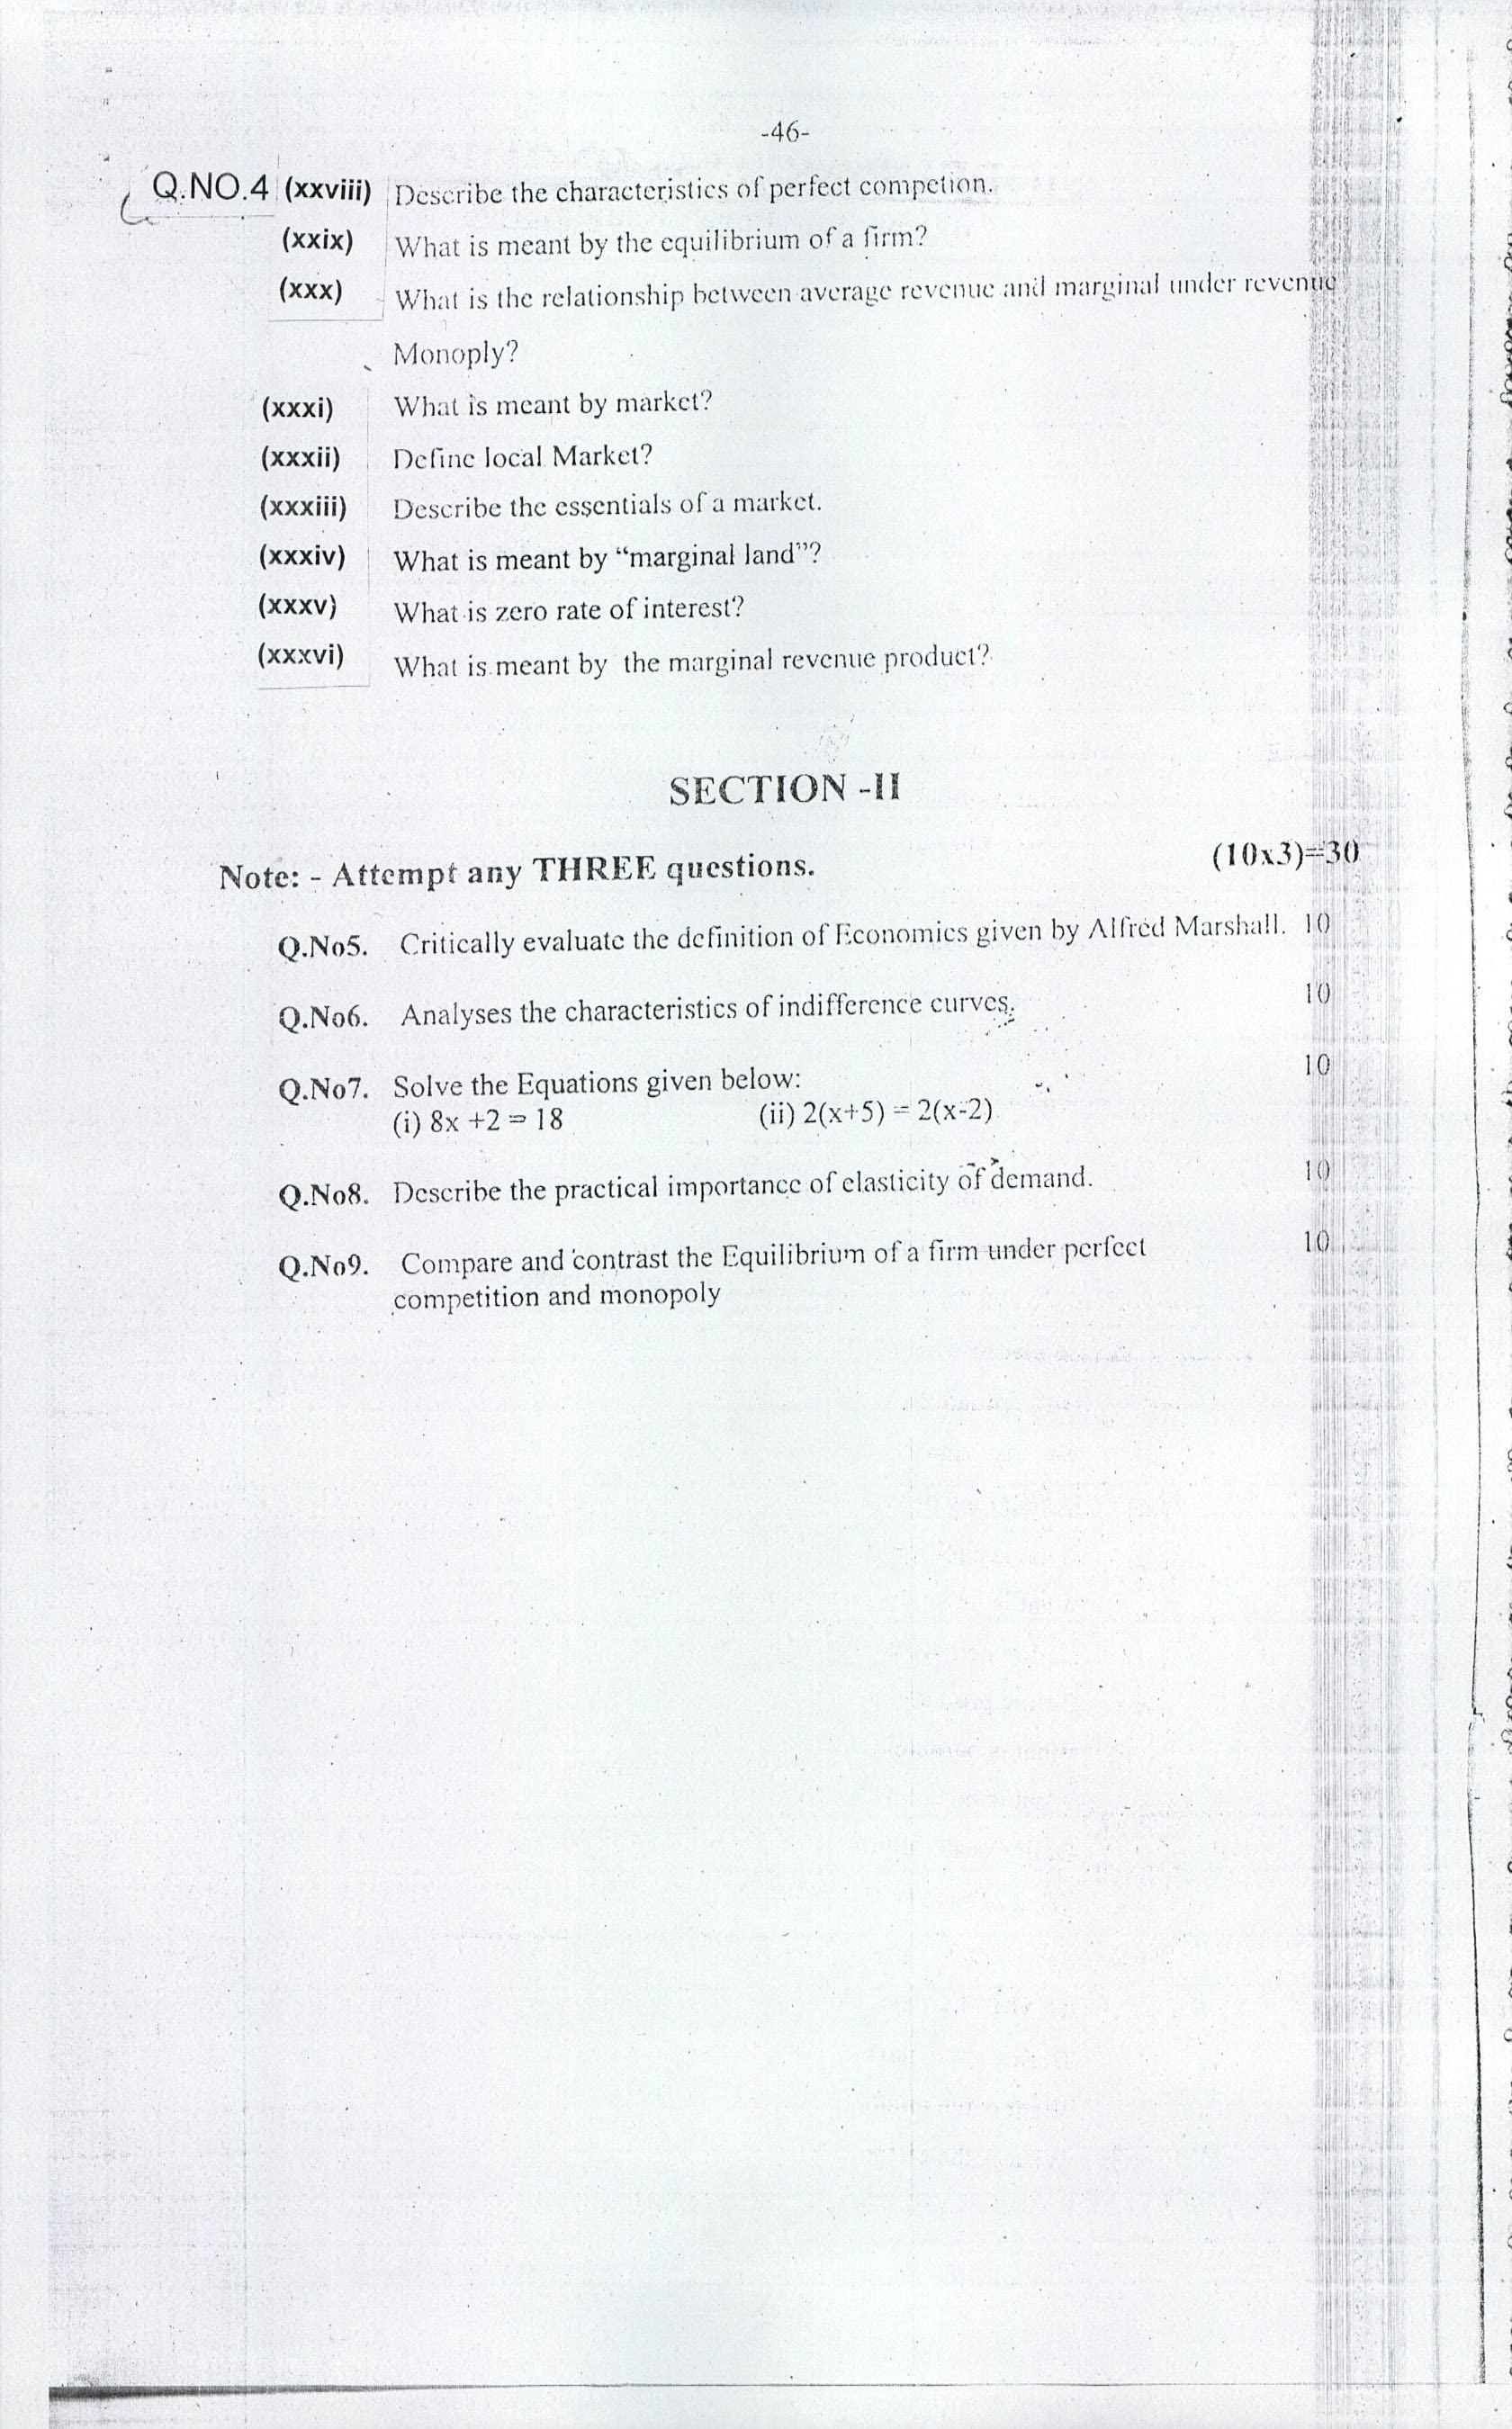 senior intermediate economics model papers Bihar intermediate model papers 2018 bseb 12th sample papers 2018 download at biharboard bihar board senior intermediate 12th class model papers economics.